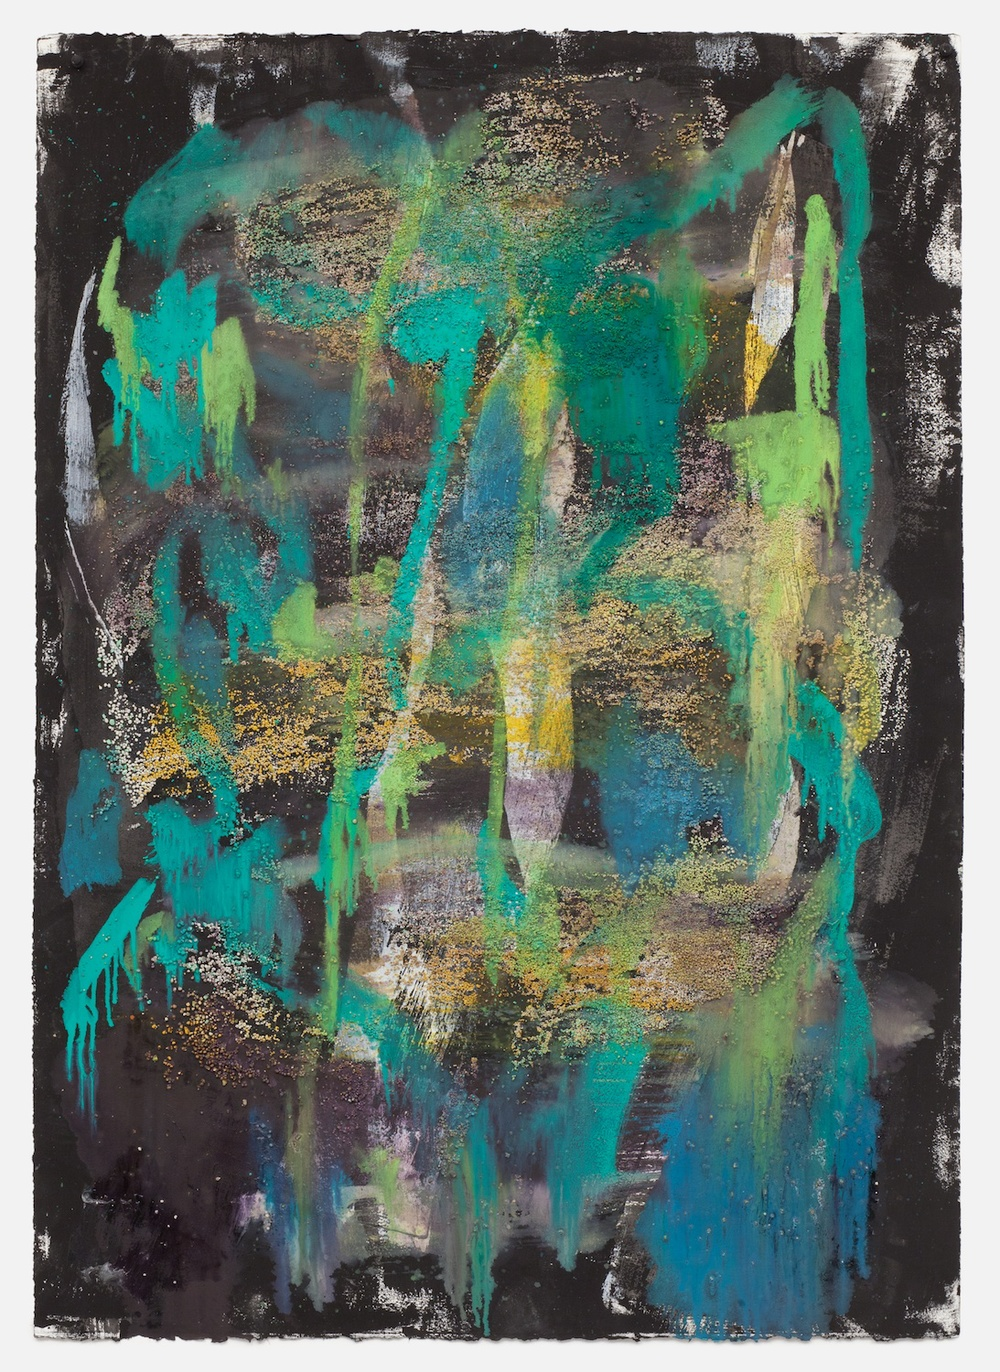 "Jon Pestoni Untitled 2013 Oil and mixed media on paper 40"" x 30"" JP142"